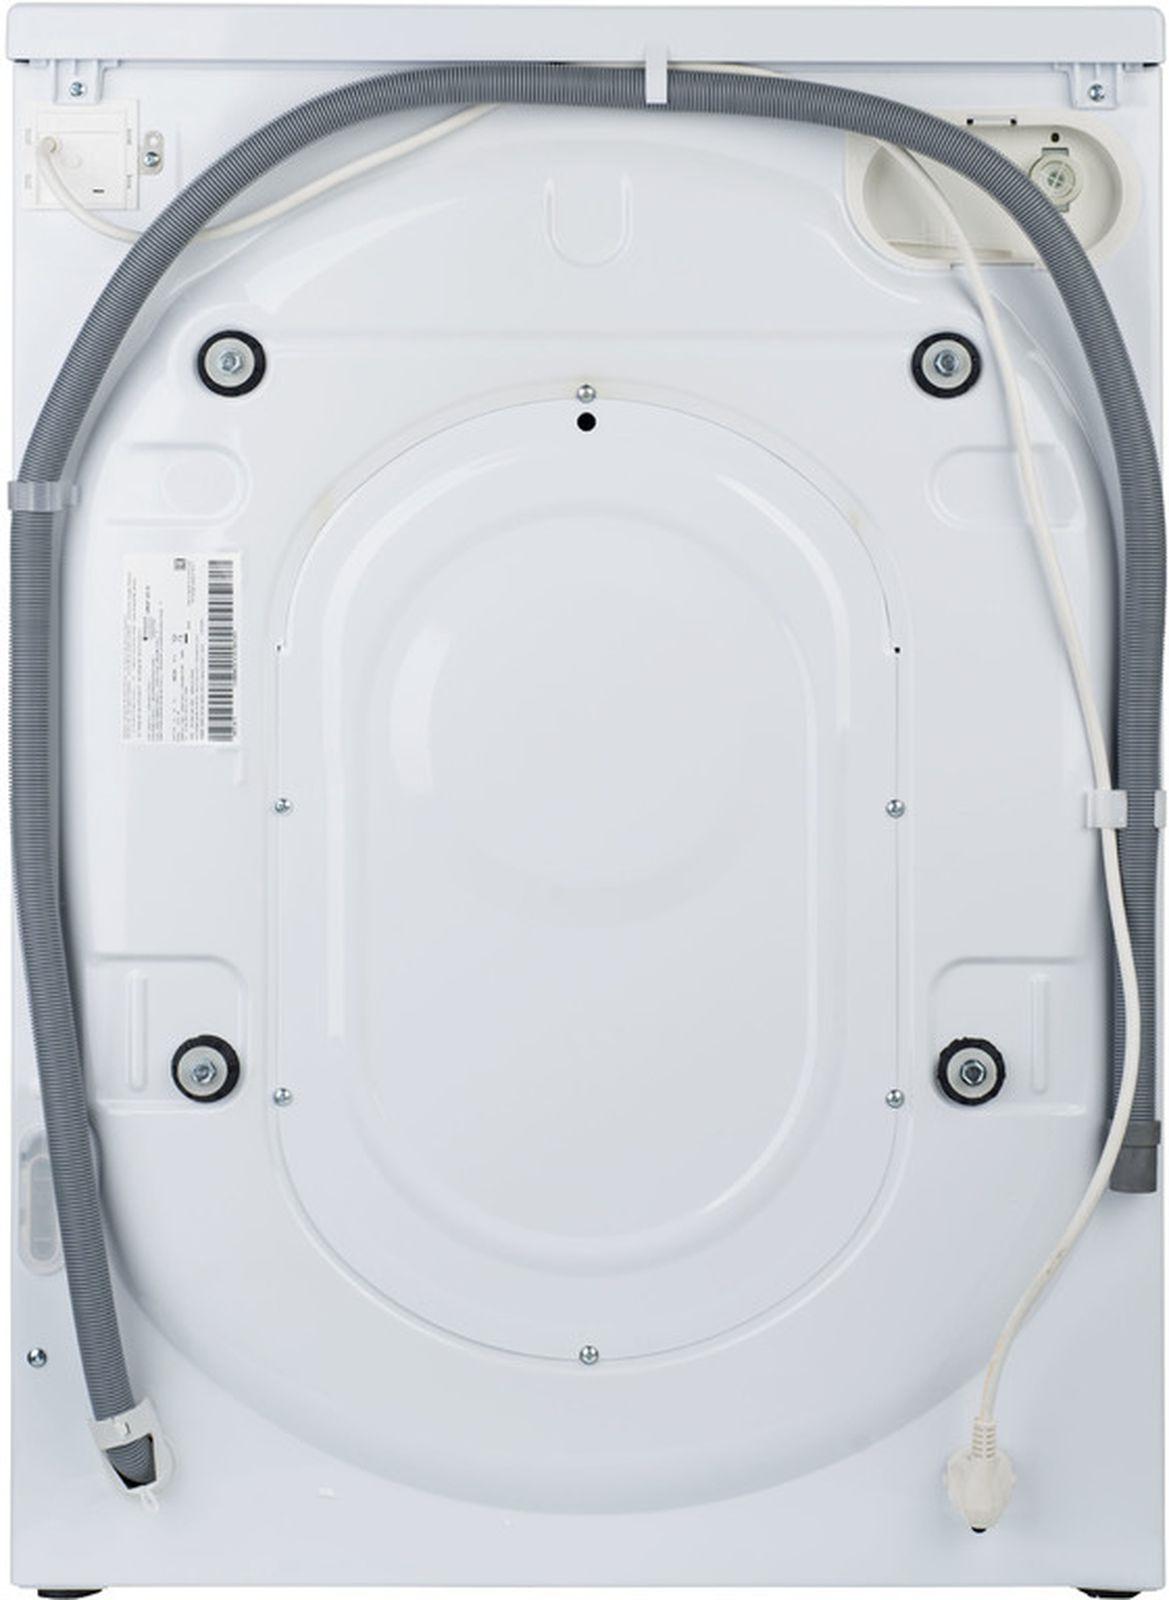 Стиральная машина Hotpoint-Ariston VMUG 501 B, 88960, белый Hotpoint-Ariston